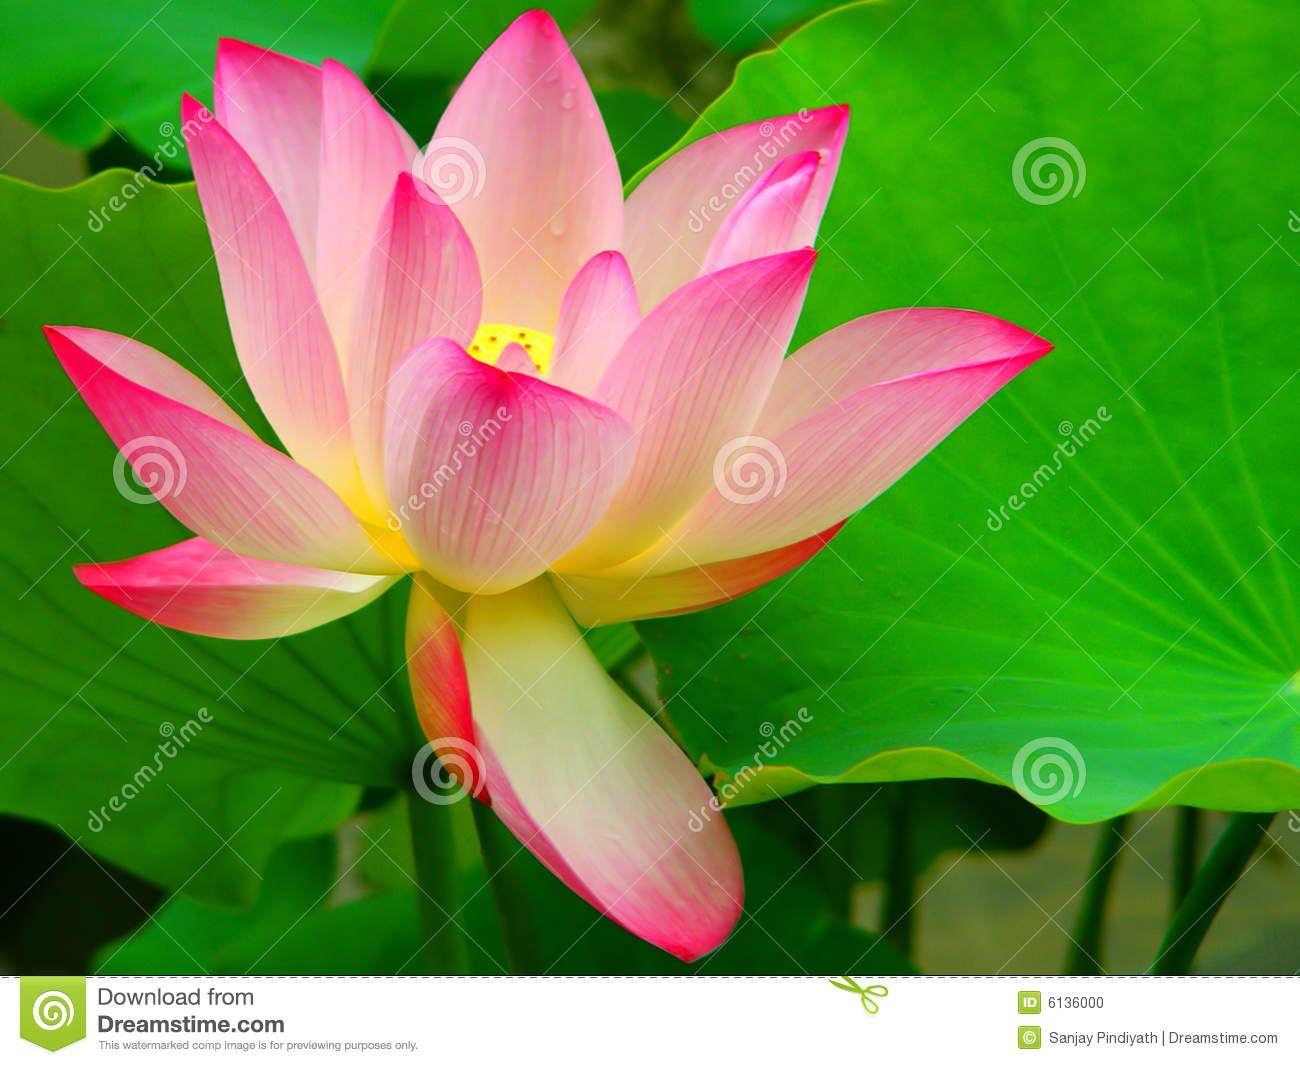 Beautiful lotus flower stock photo image of flower tropical beautiful lotus flower stock photo image of flower tropical 6136000 izmirmasajfo